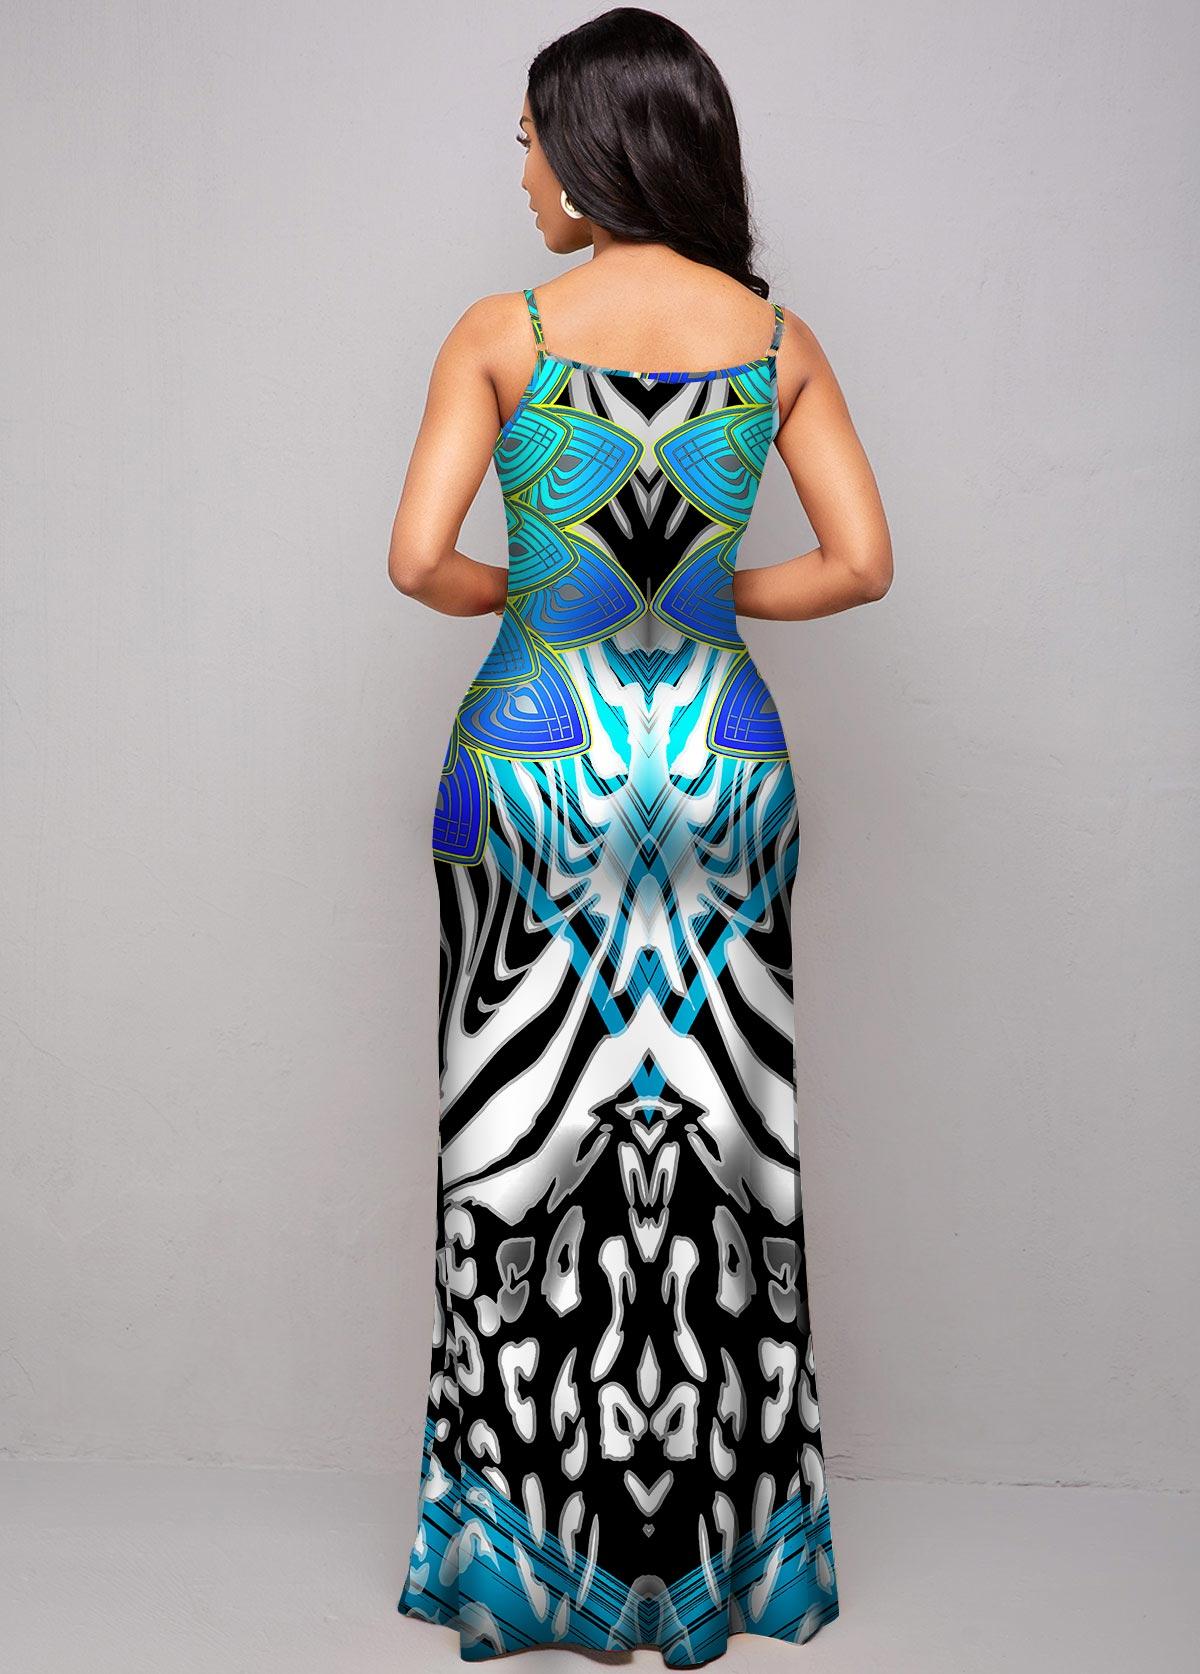 Leopard and Tribal Print Spaghetti Strap Dress